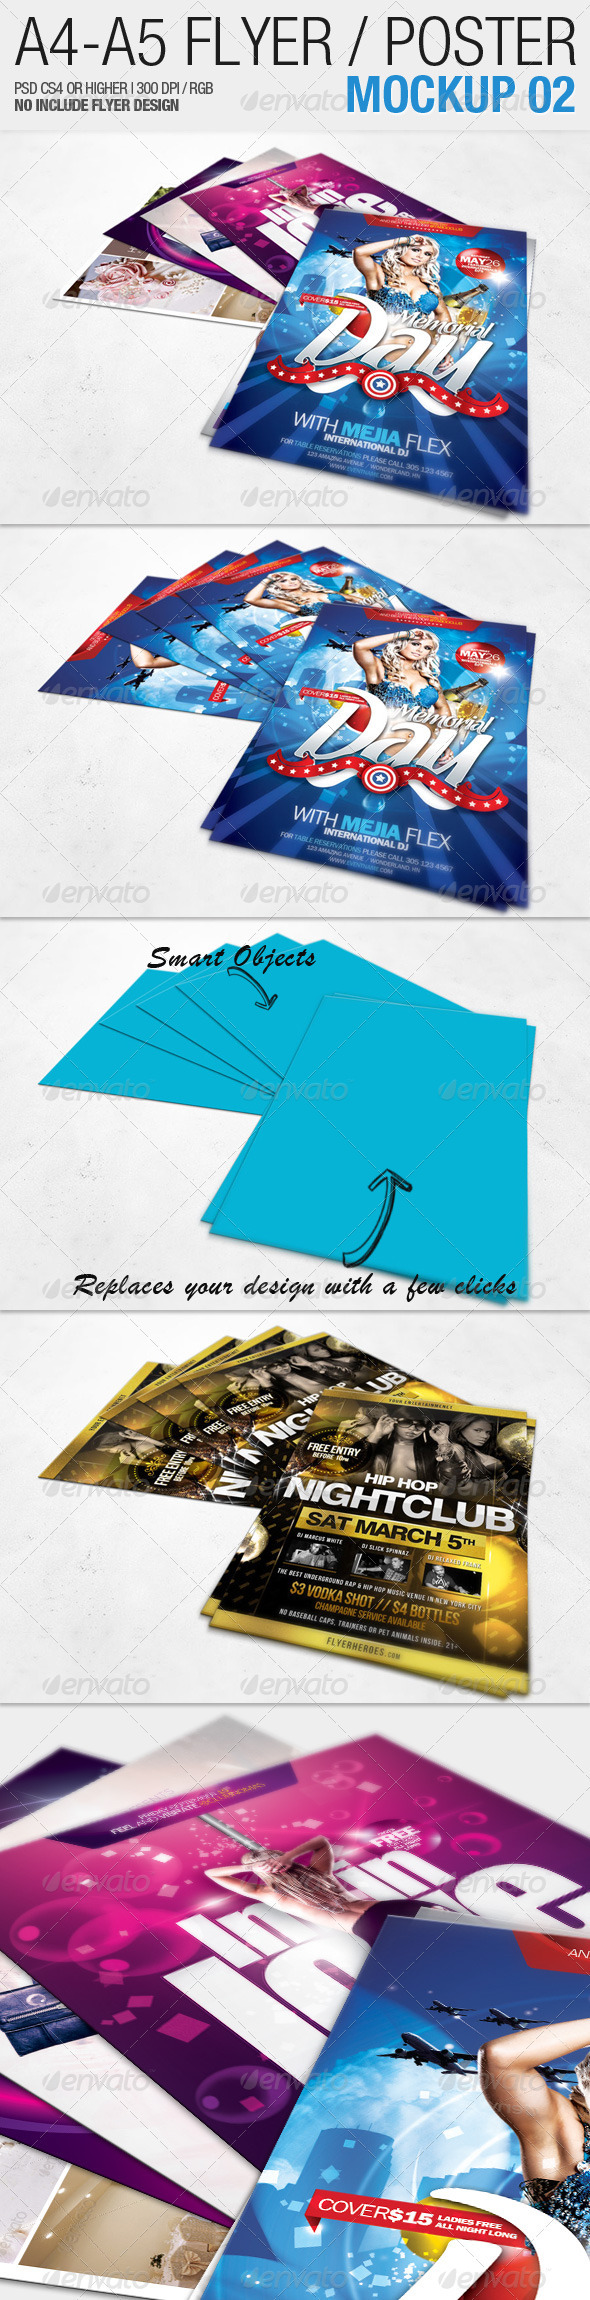 GraphicRiver A4 A5 Flyer Mockup 02 2311042